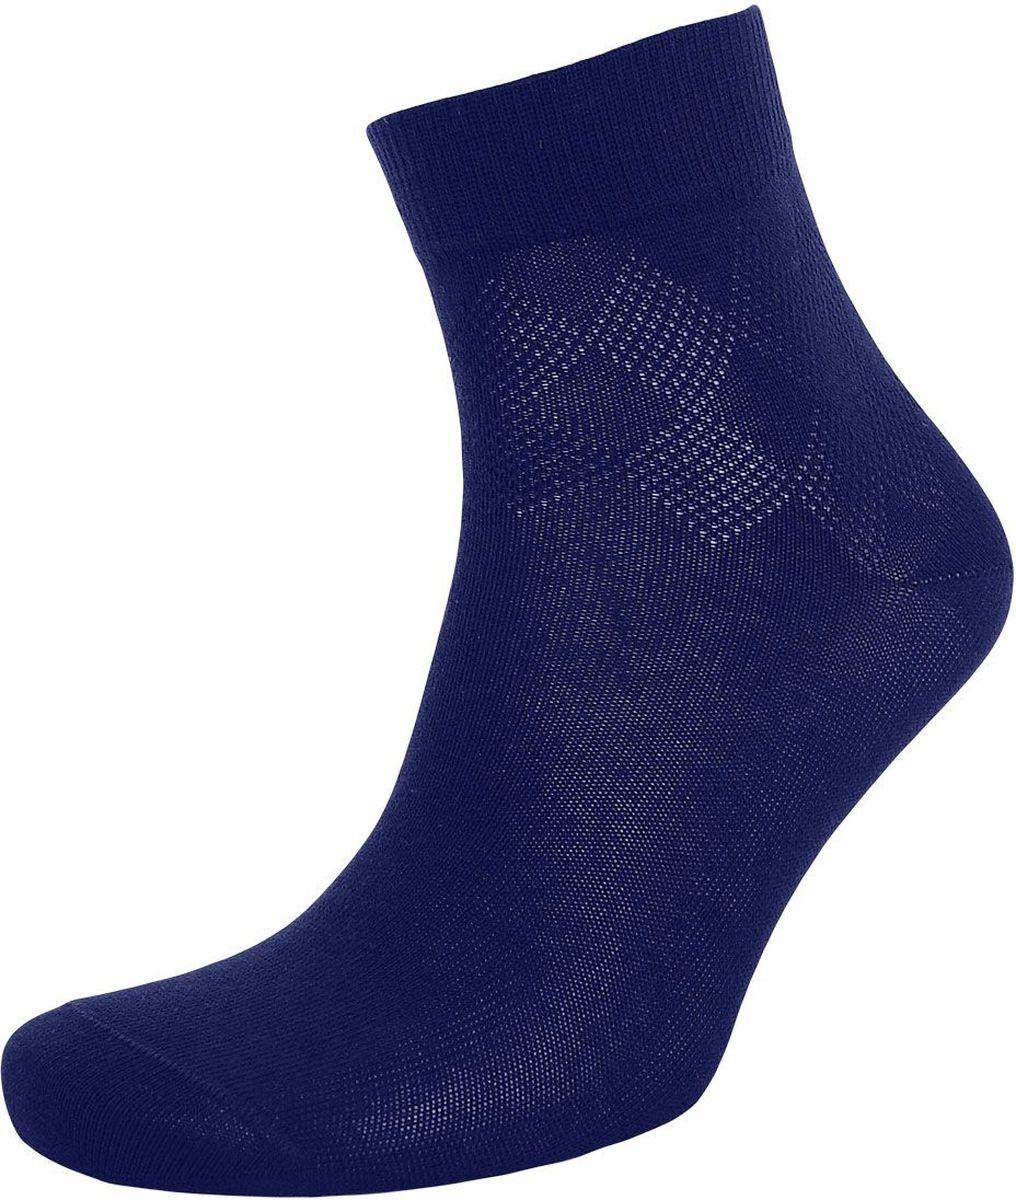 Носки мужские Гранд, цвет: синий, 2 пары. ZC116. Размер 29 носки гранд носки